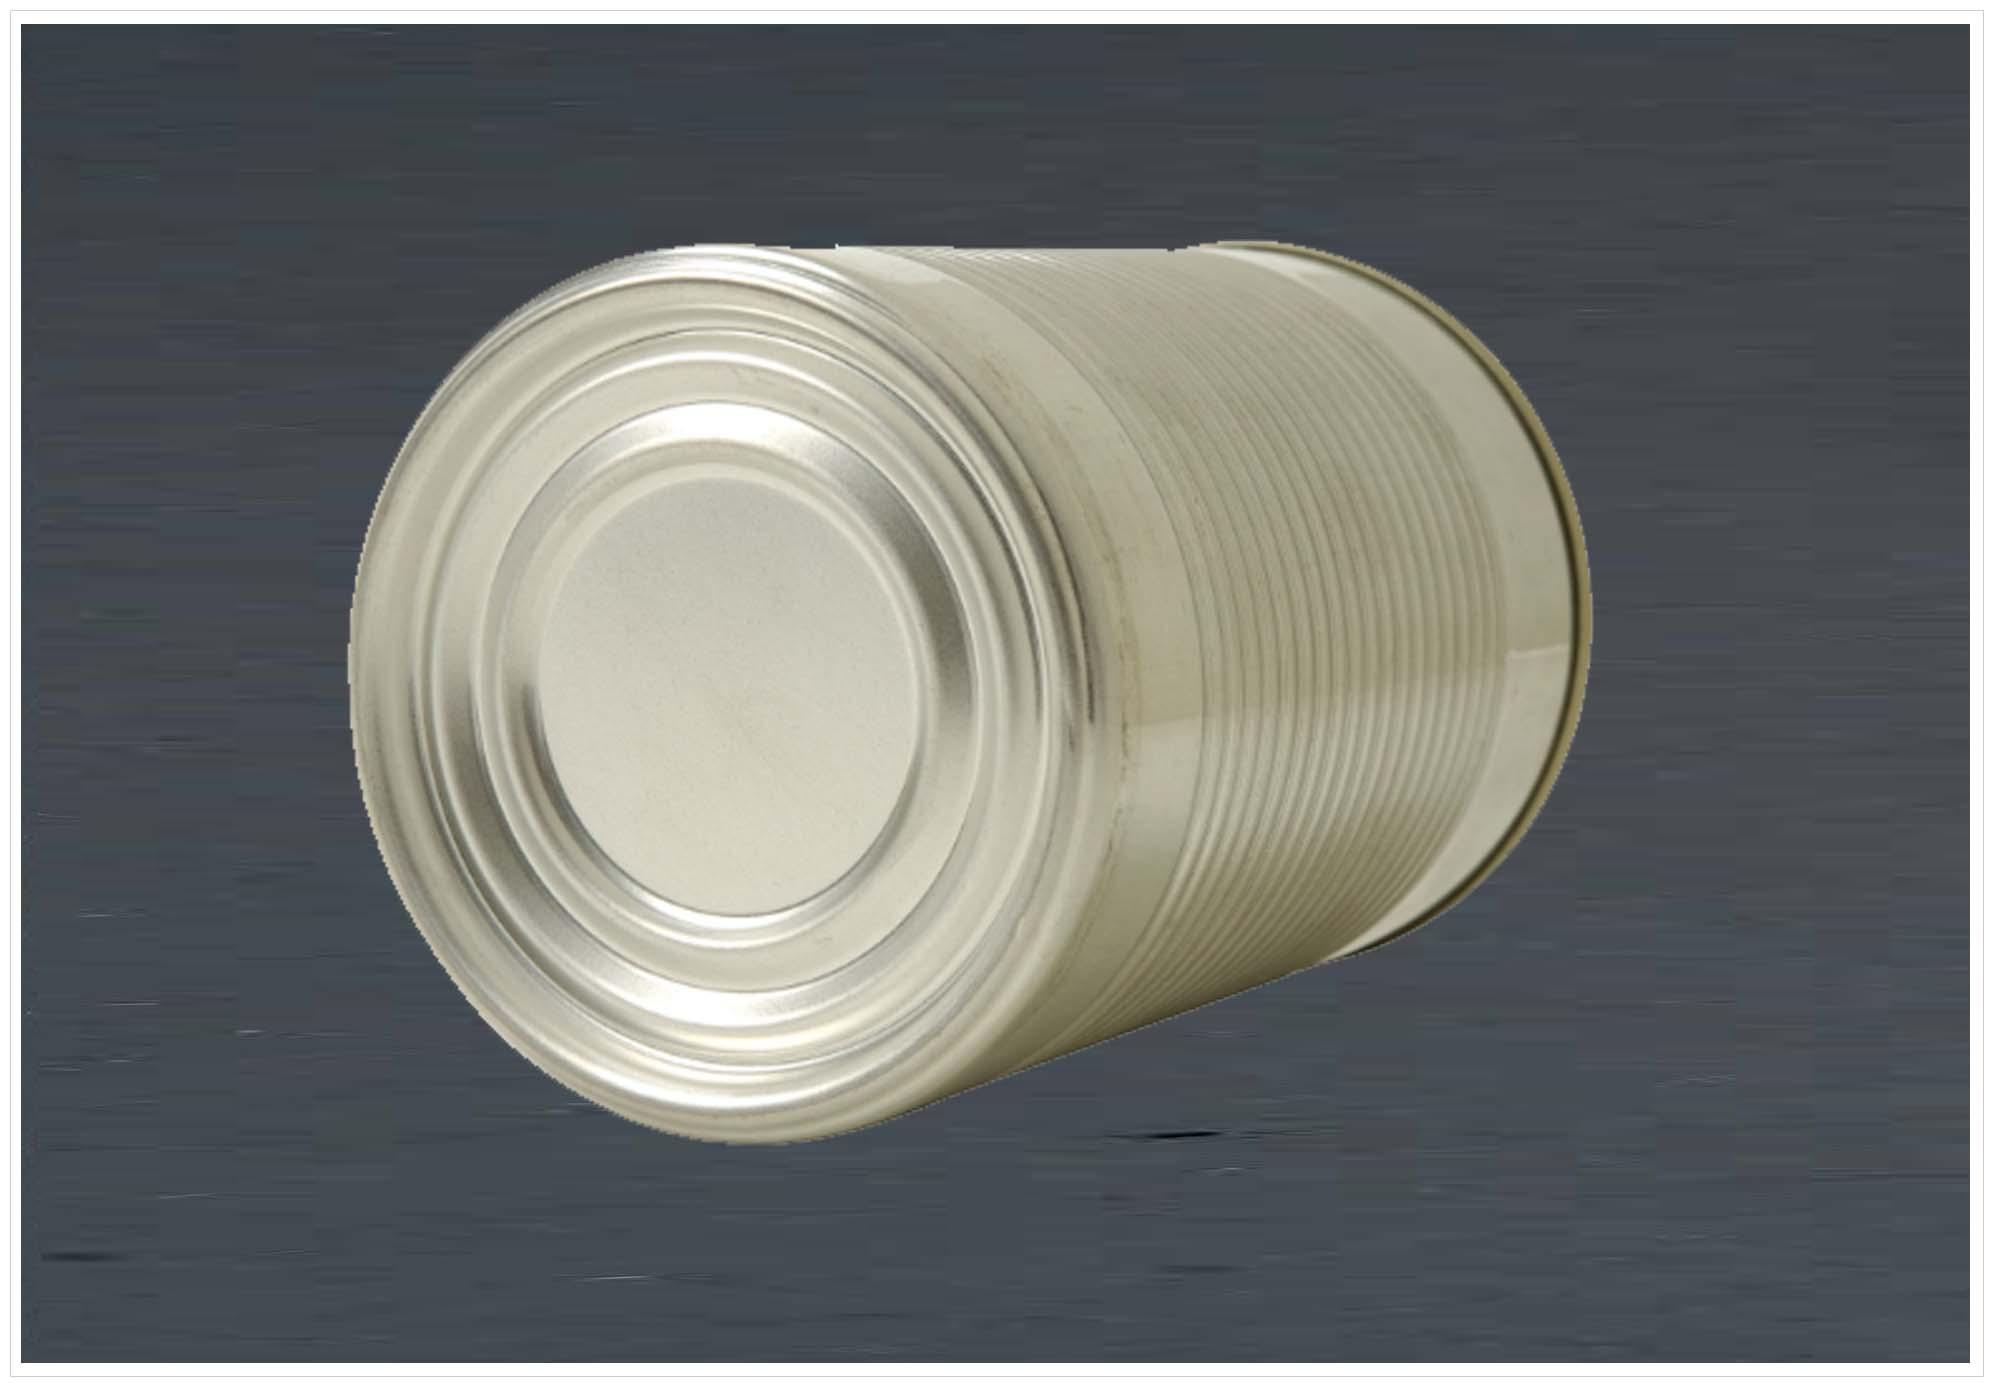 2-Piece DWI Steel Can